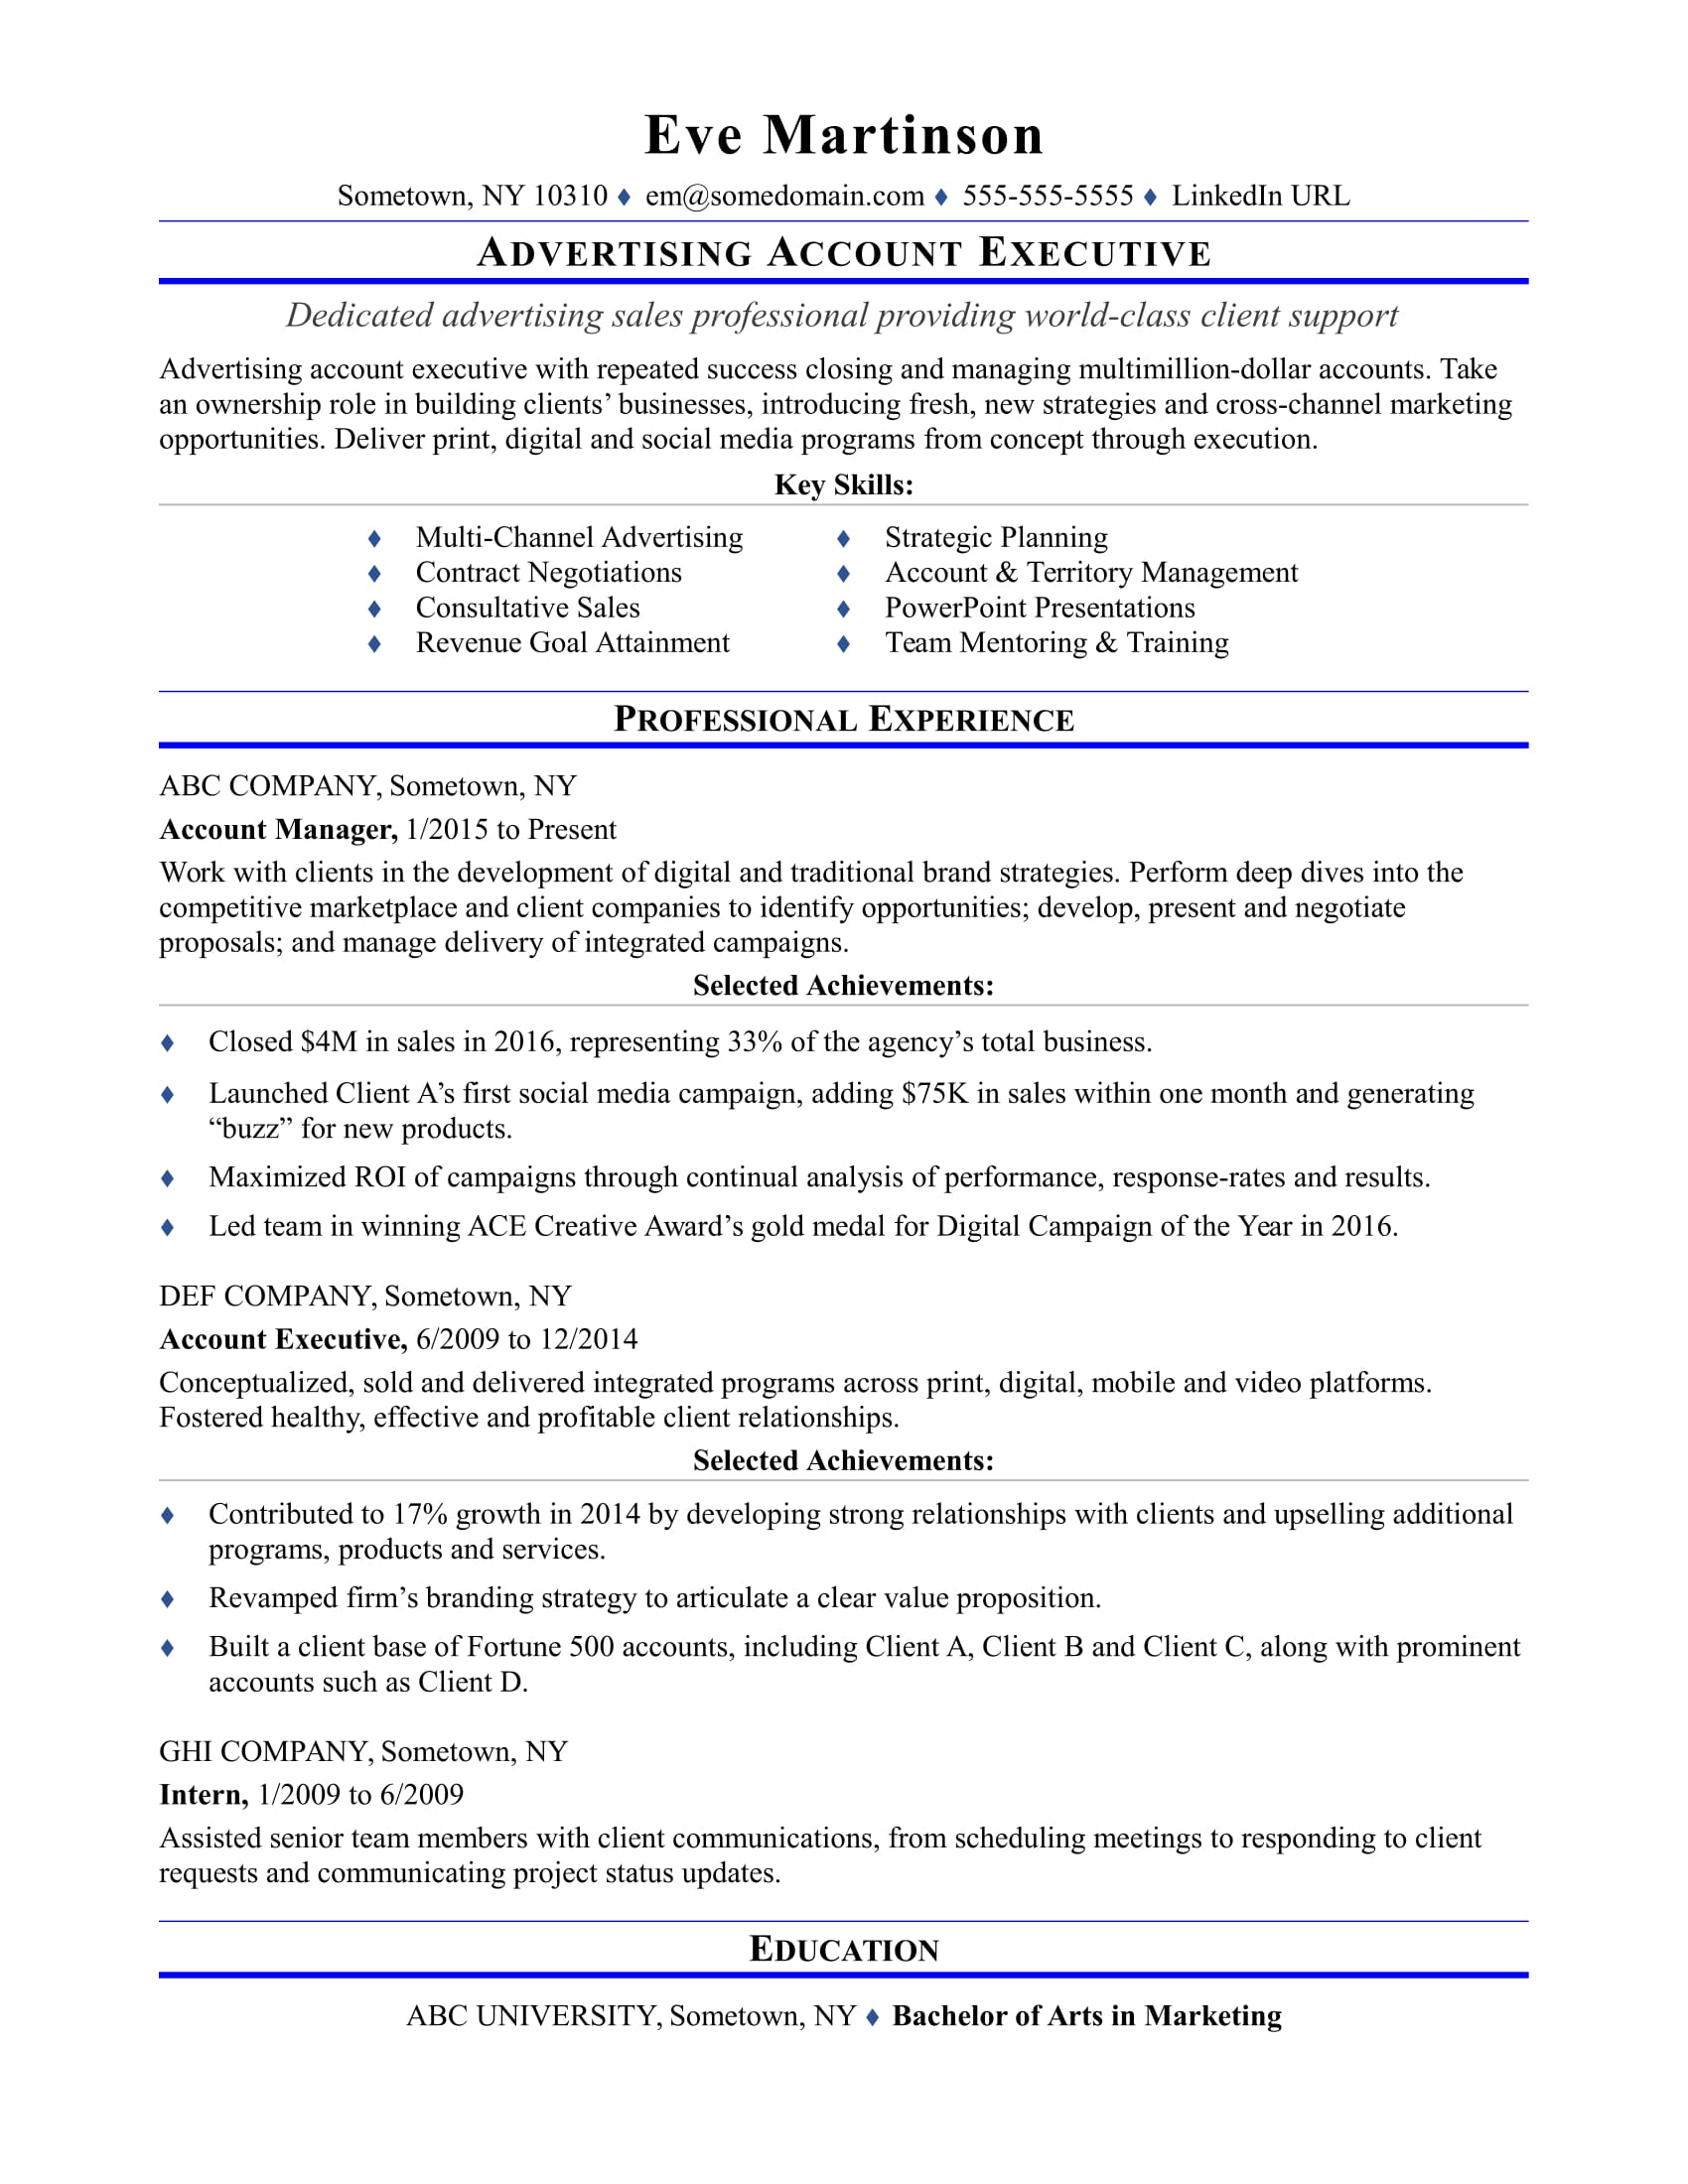 Broadcast media buyer resume